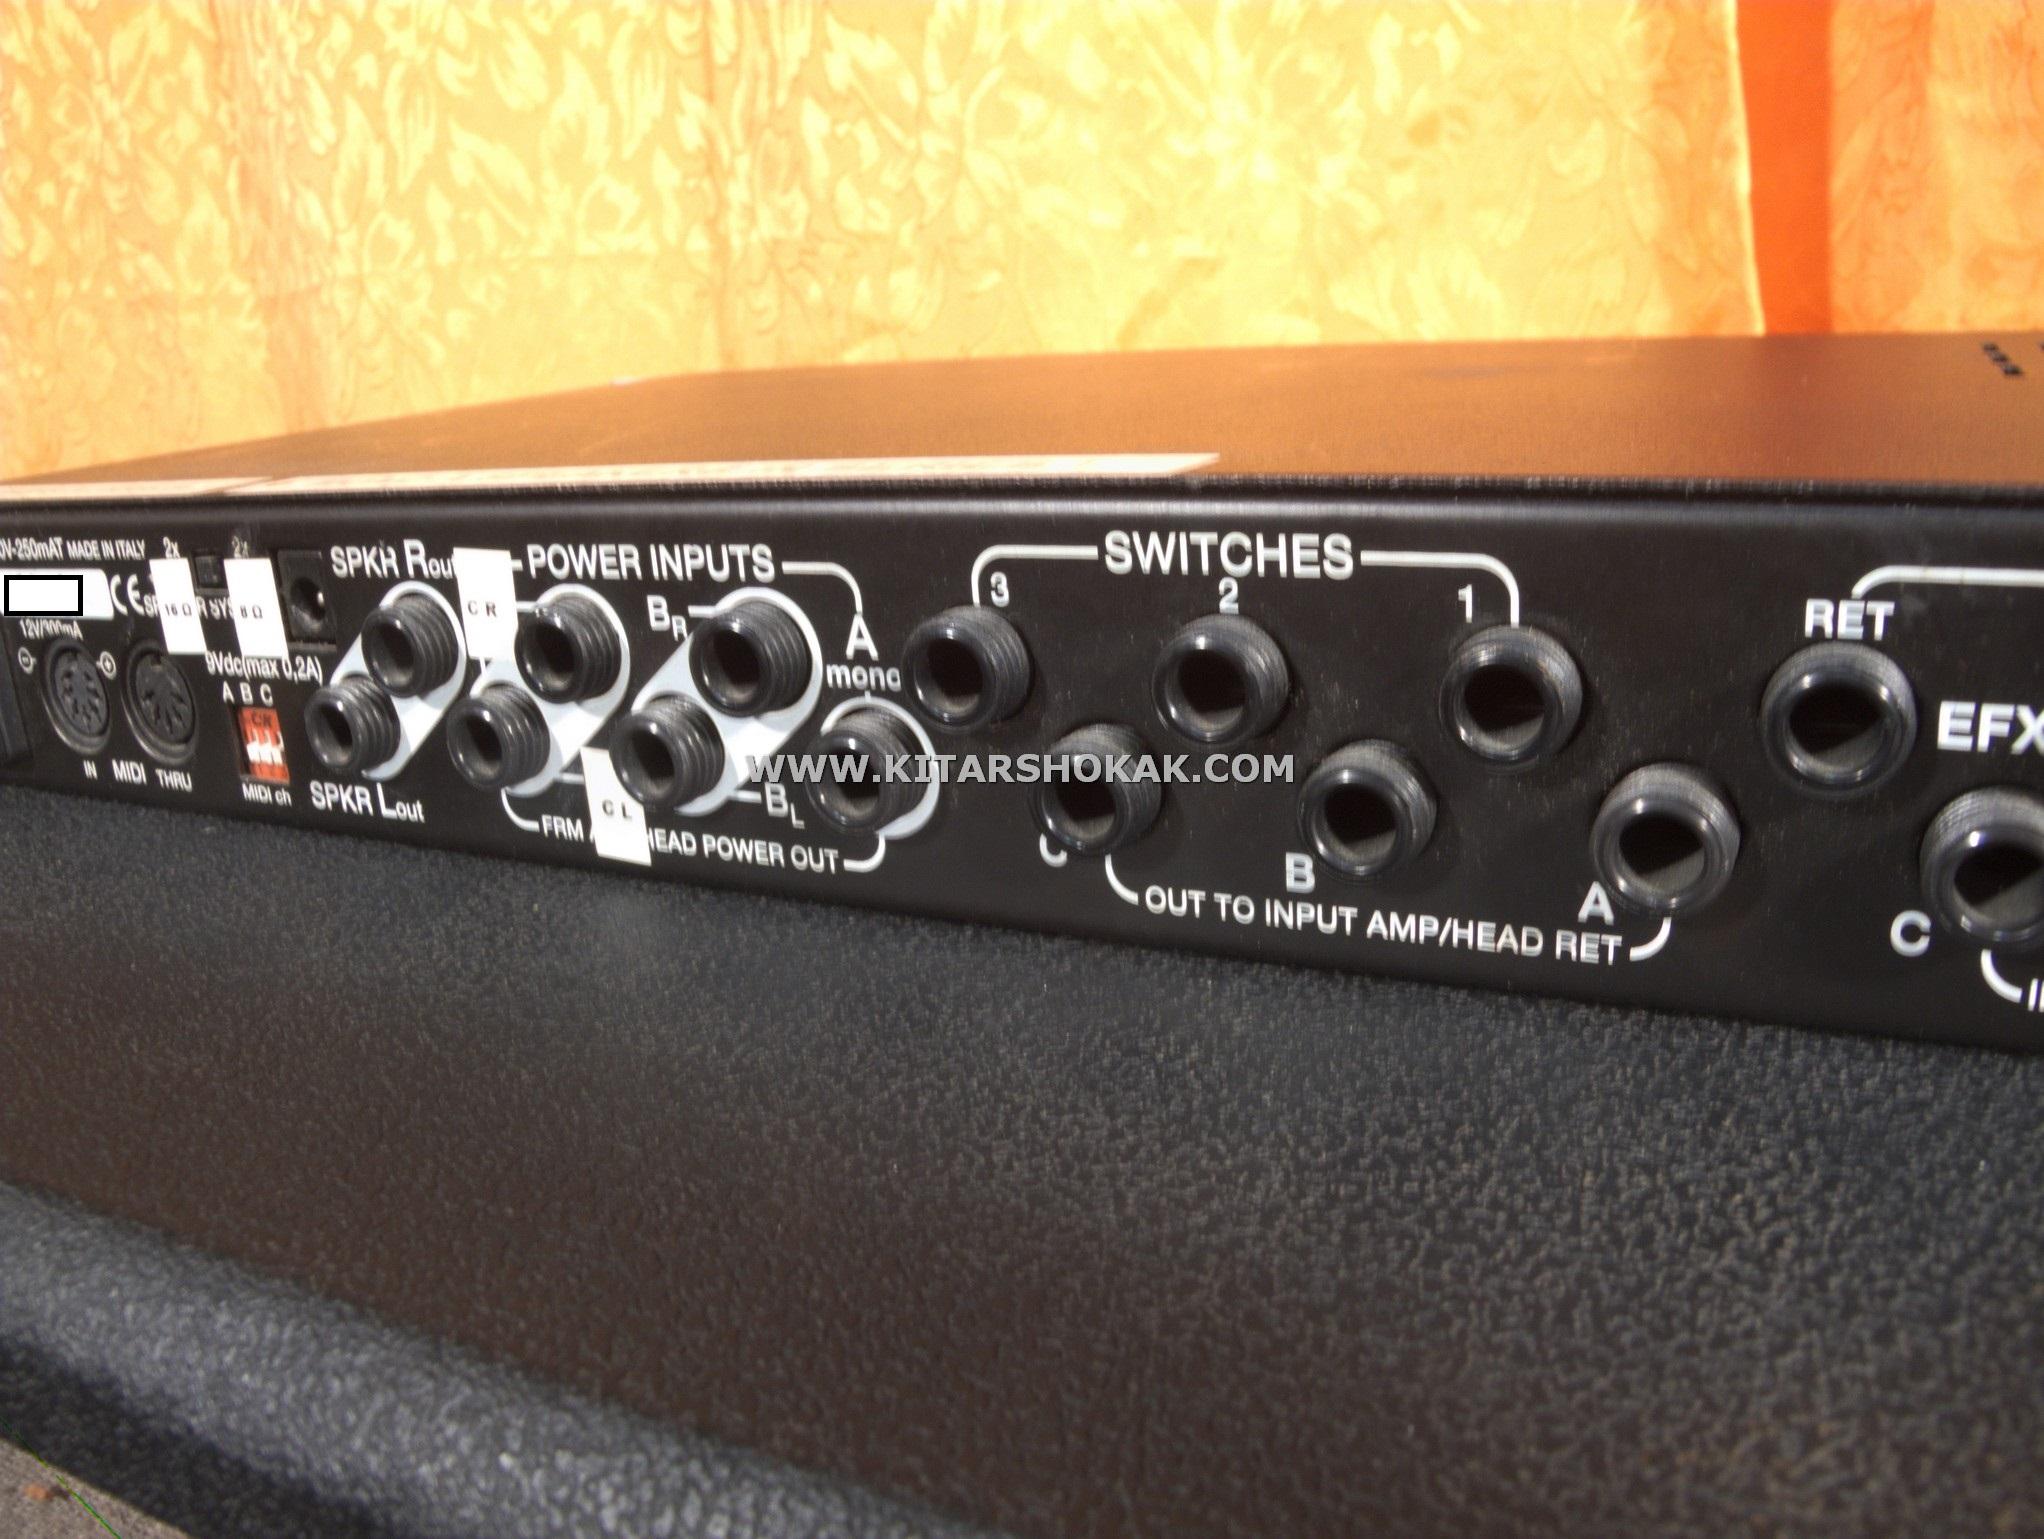 Brunetti MATRIX 2000's Grey Amp For Sale Kitarshokak